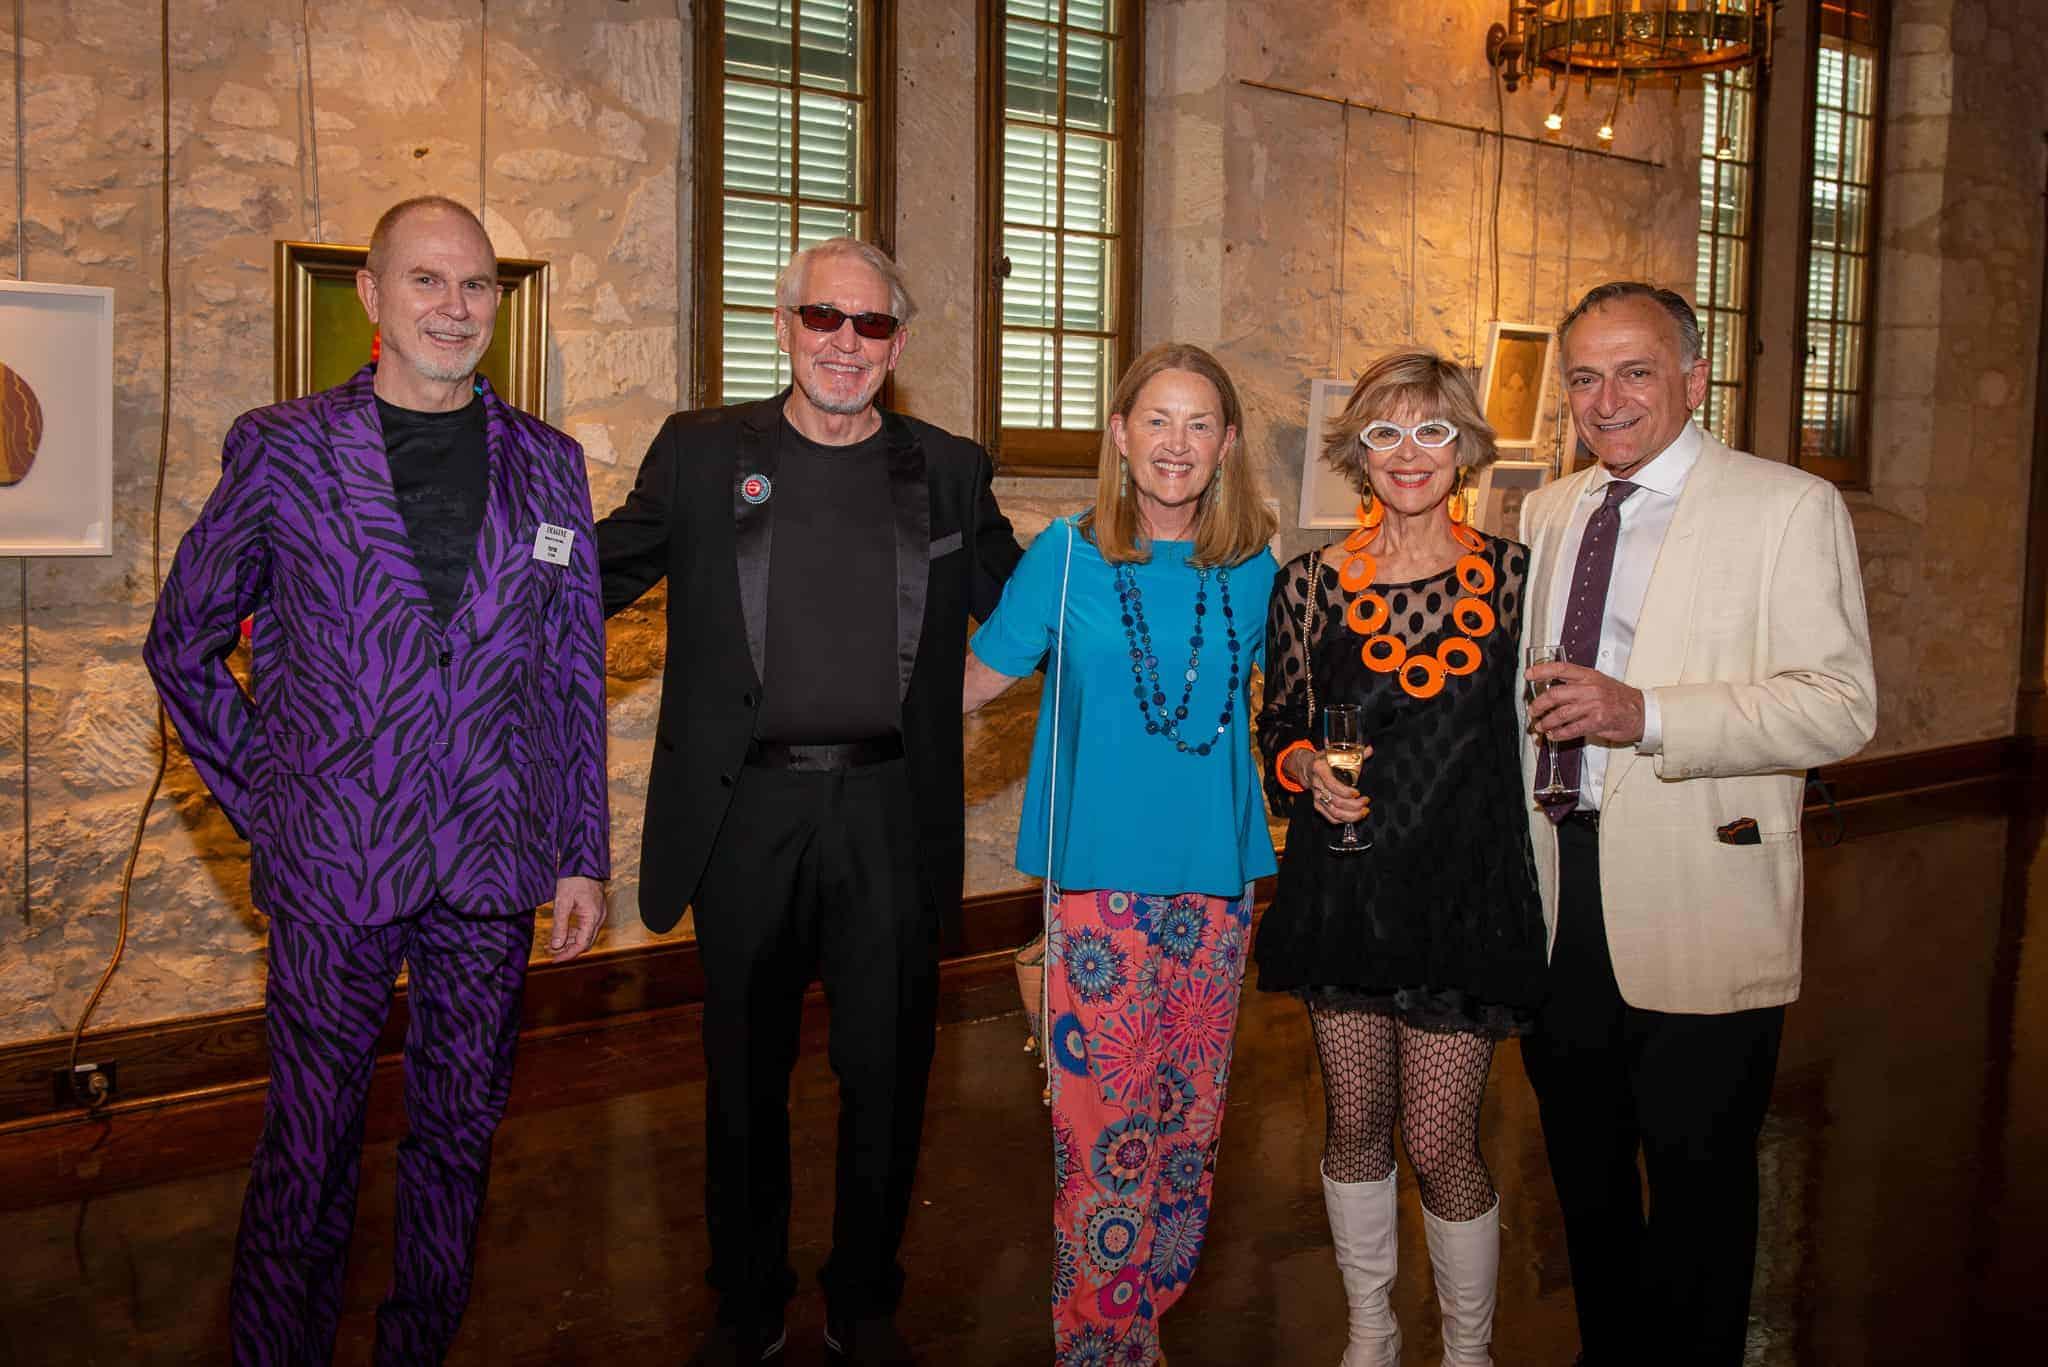 Patrick Merritt, Ben _ Paula Owen, Patricia Pratchett and Dr. Bart Nichols